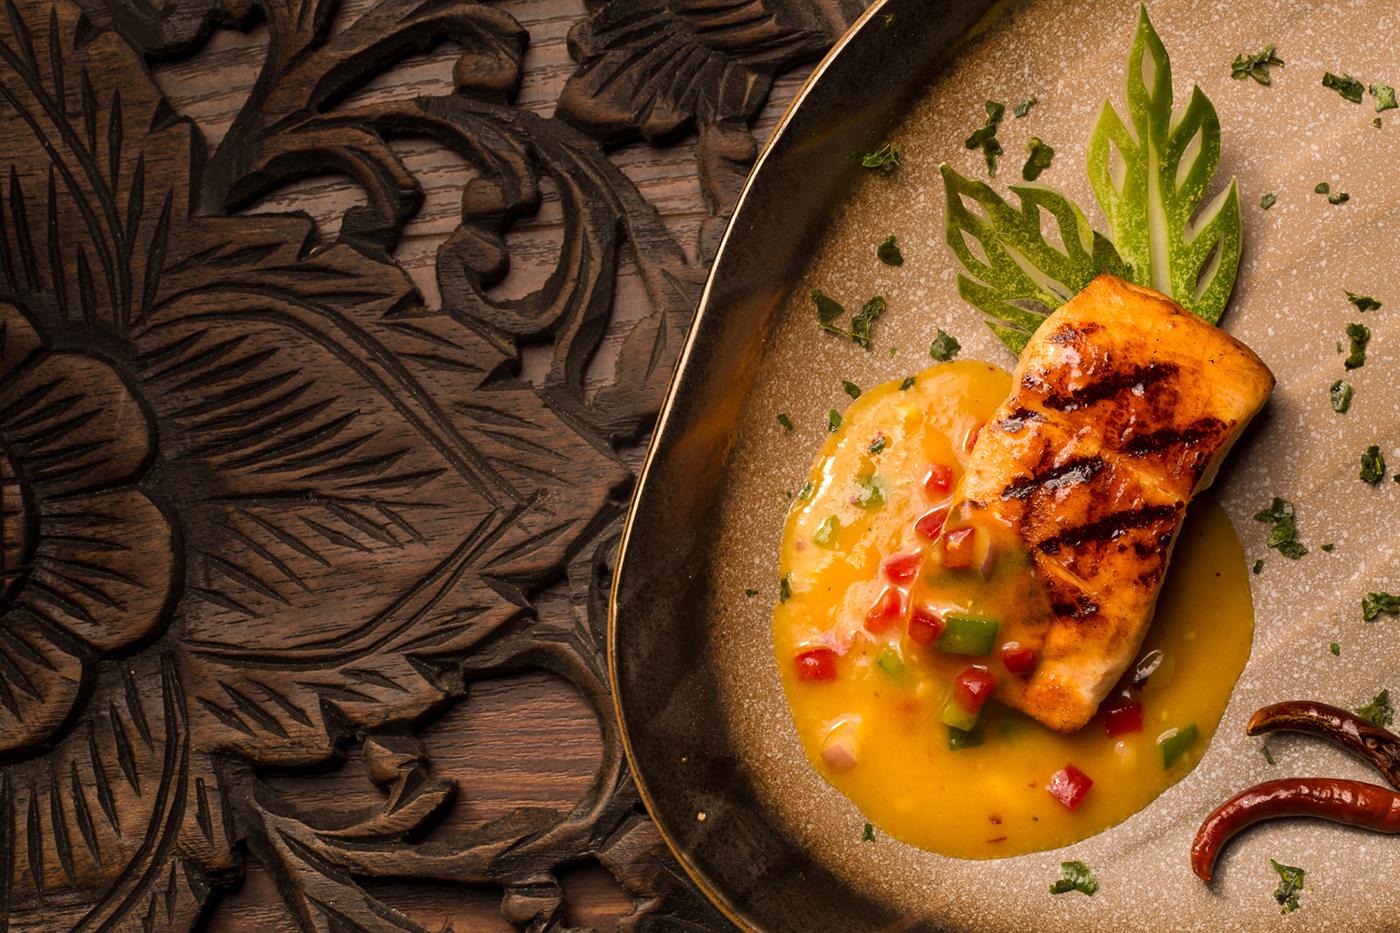 DAO - Food & Beverage Photography / фото Shreya Sarawagi & Devang Singh